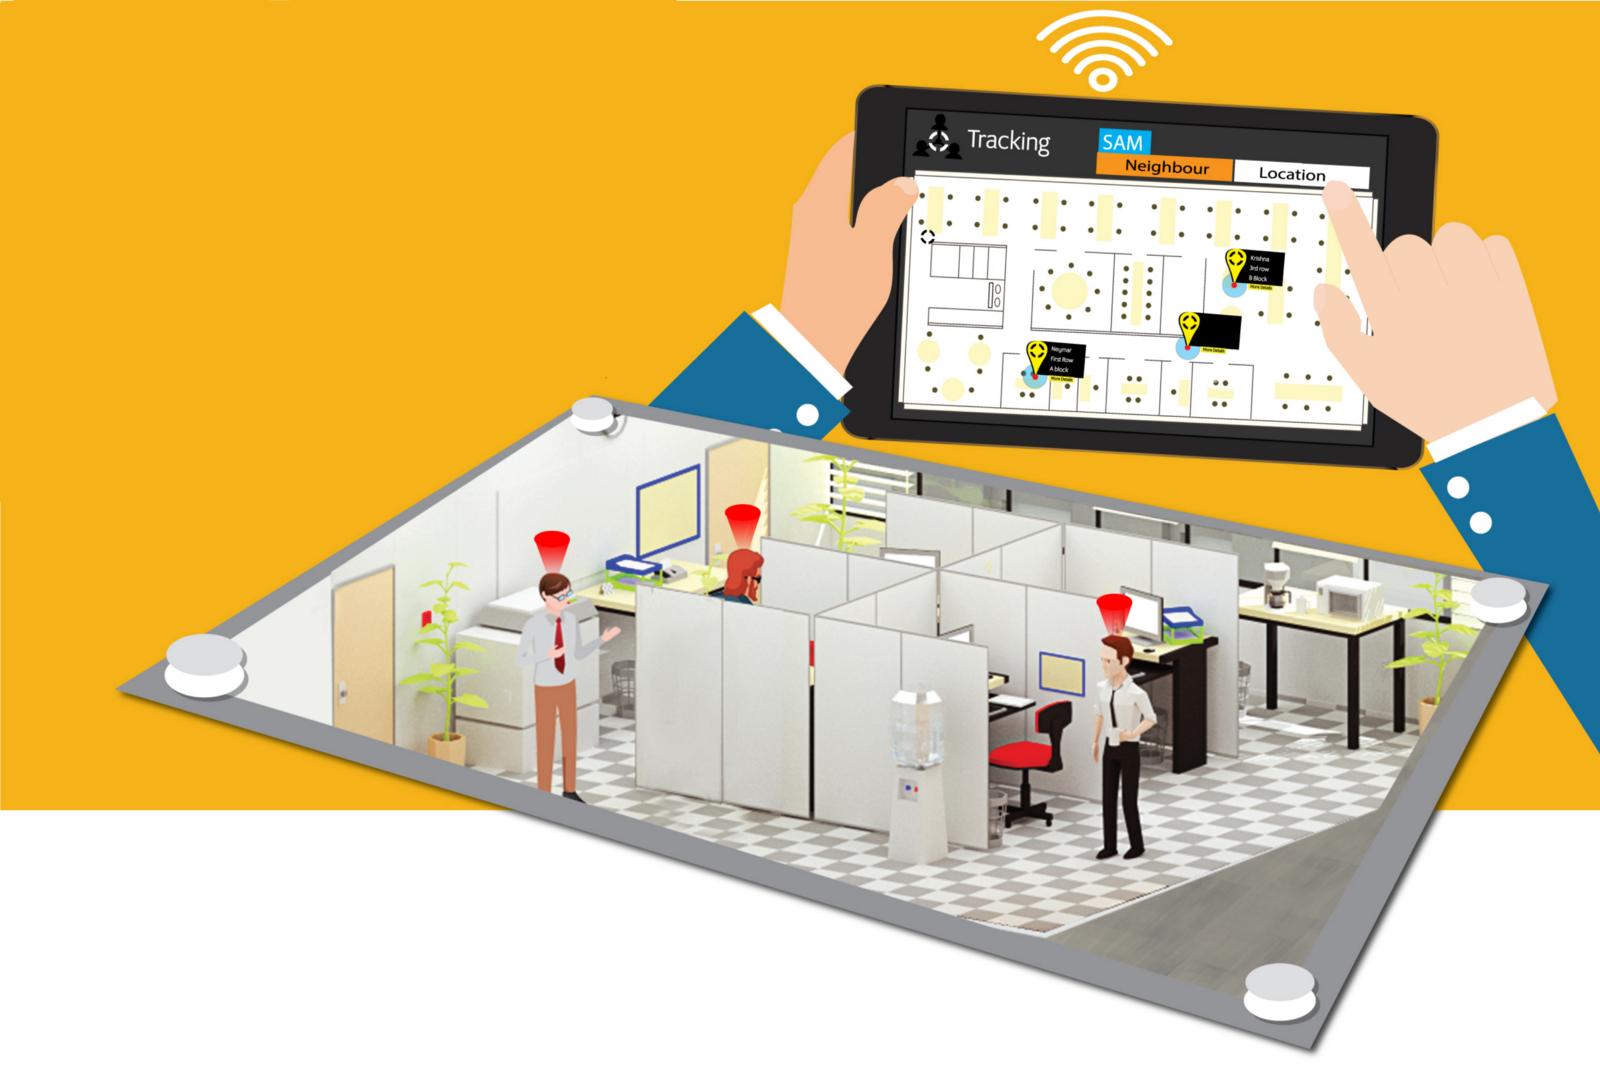 /https-medium-com-pathpartnertech-ultra-wideband-uwb-technology-for-indoor-positioning-a5fbe76d6a4c feature image